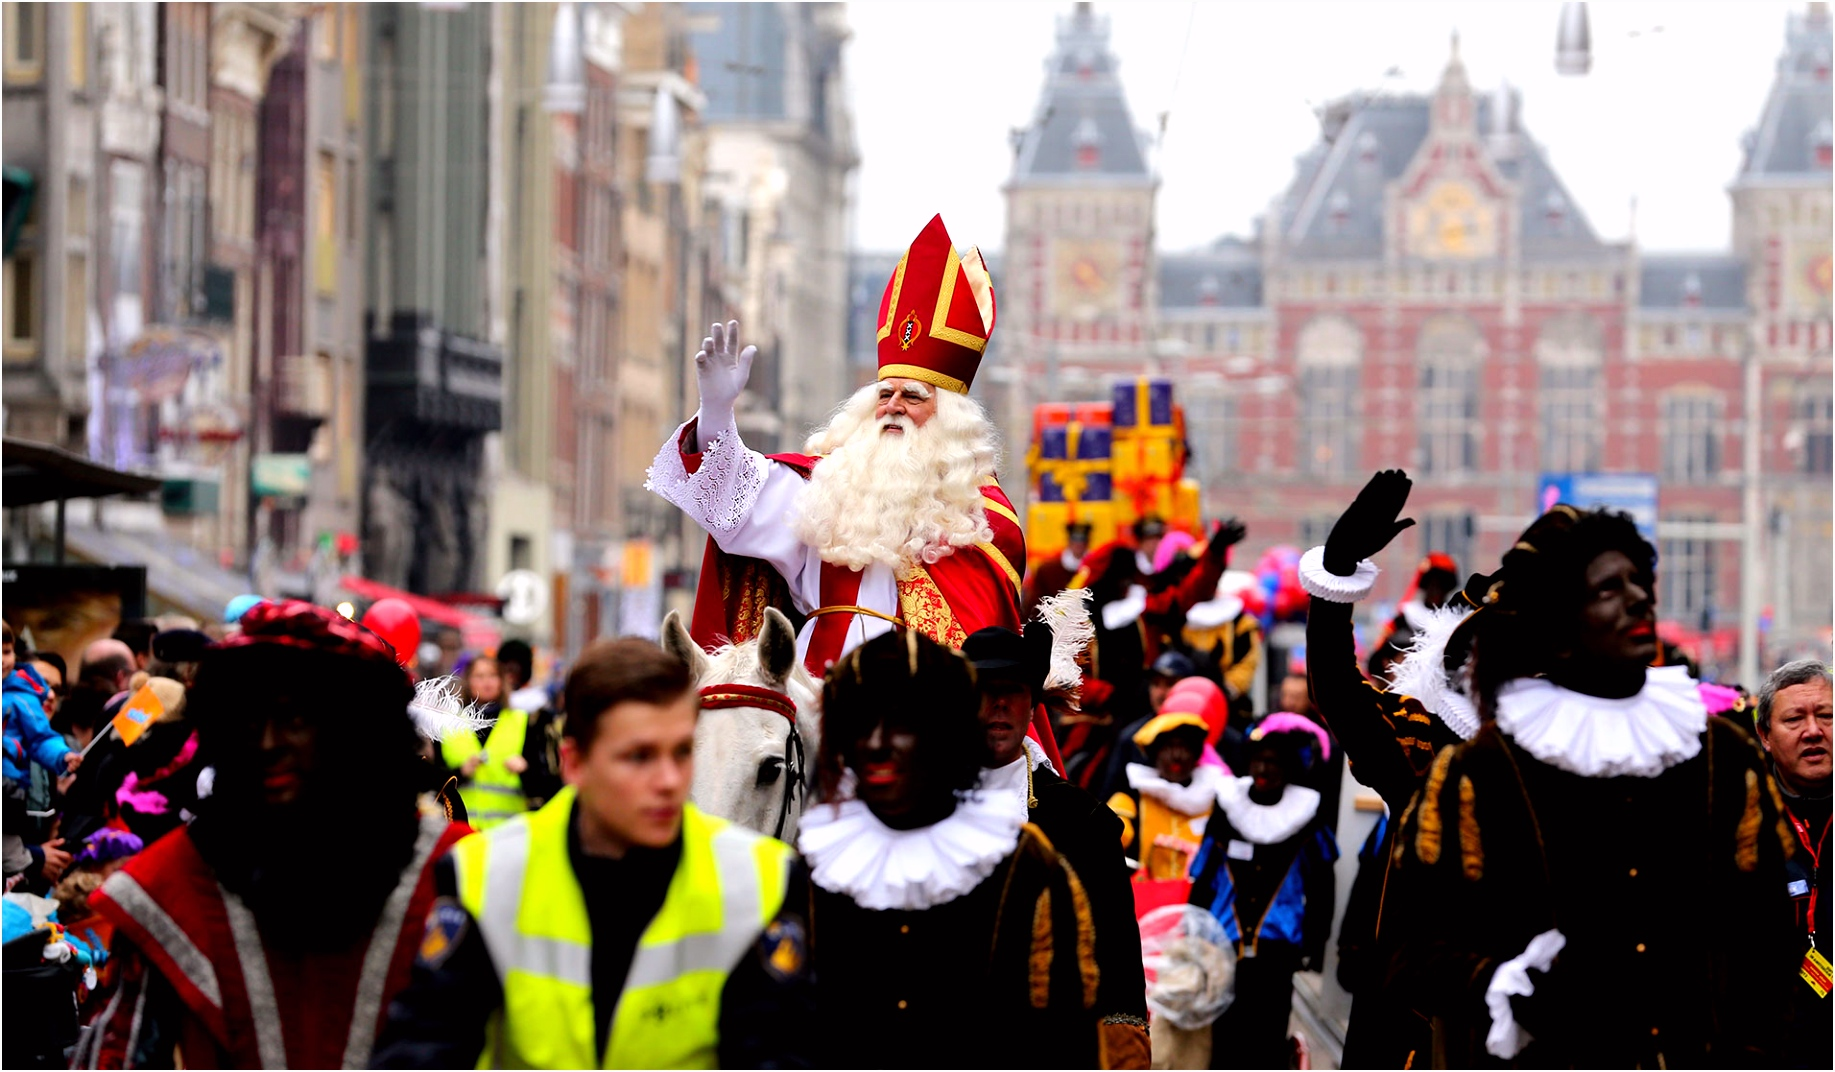 Kleurwedstrijd Sint in Amsterdam